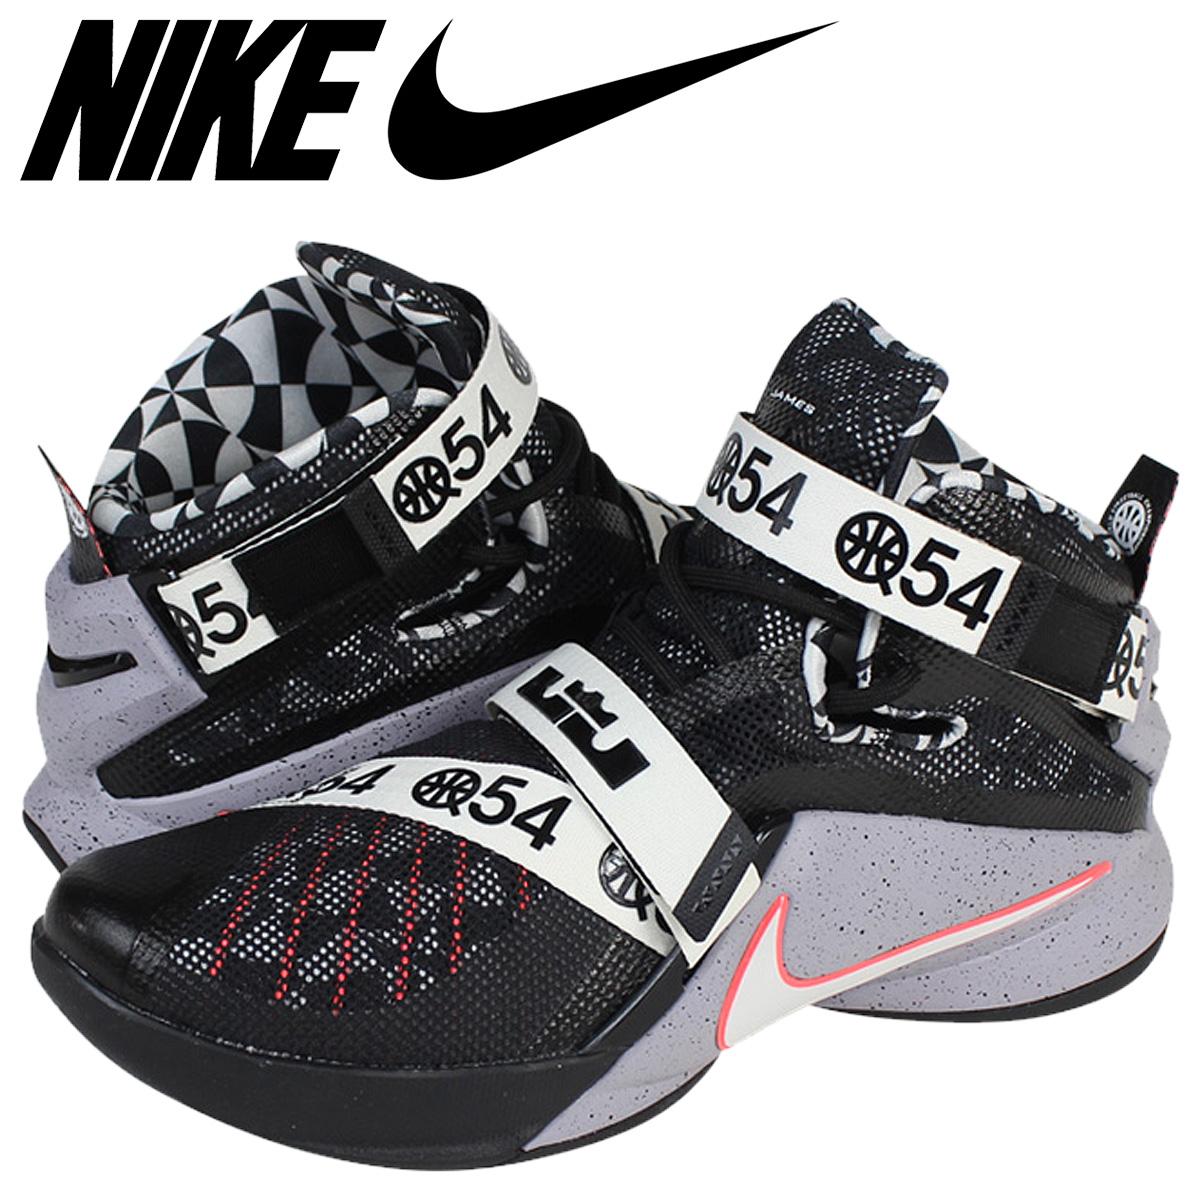 8bab6f4a7892 Nike NIKE LeBron soldier sneakers LEBRON SOLDIER IX LMTD QUAI 54 limited  Quai 54 810803-015 grey men